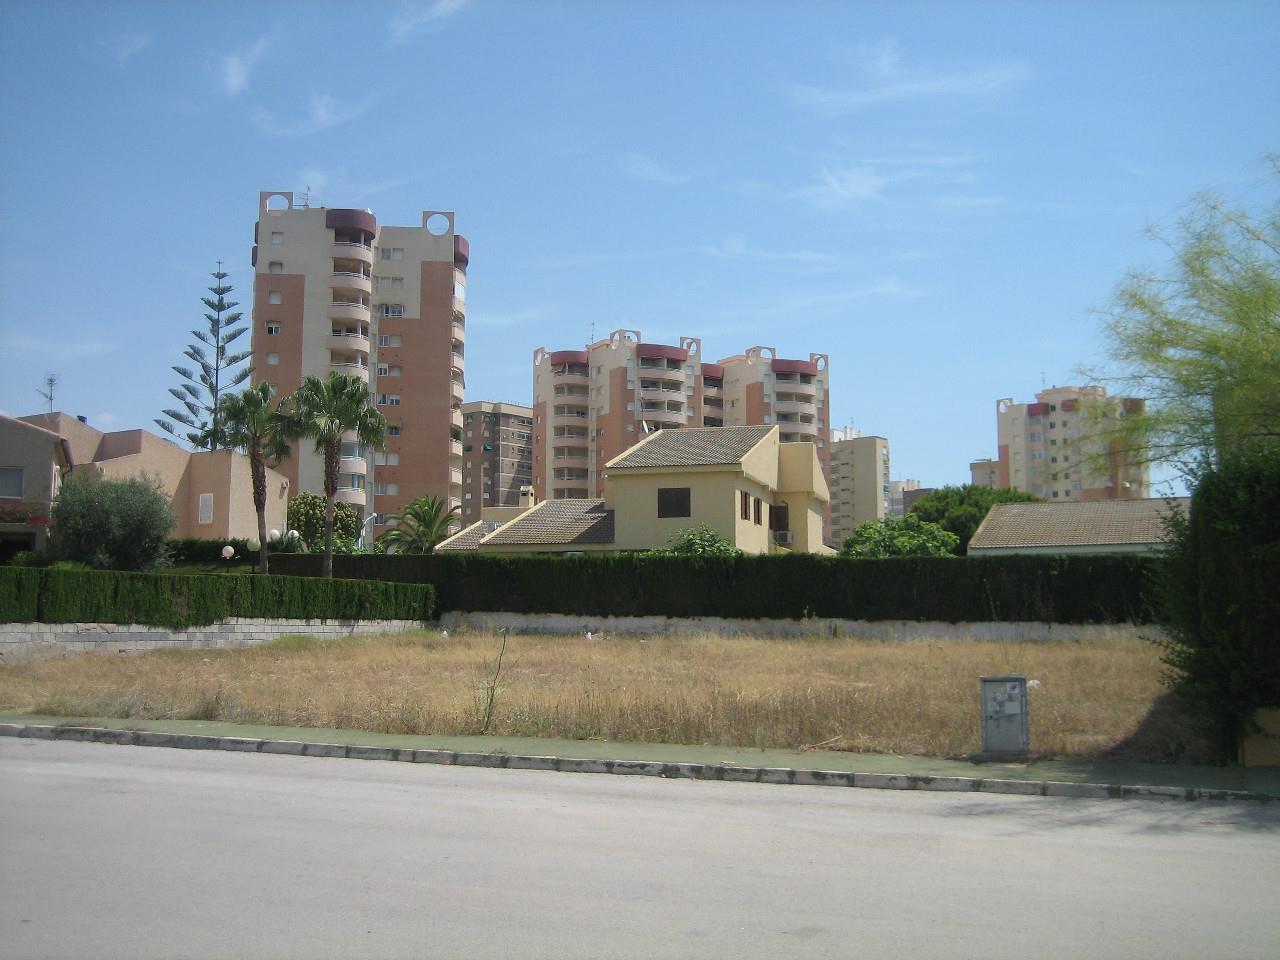 Solar urbà  Orihuela, dehesa de campoamor zona d. Particular vende parcela edificable ideal para chalet unifamilia